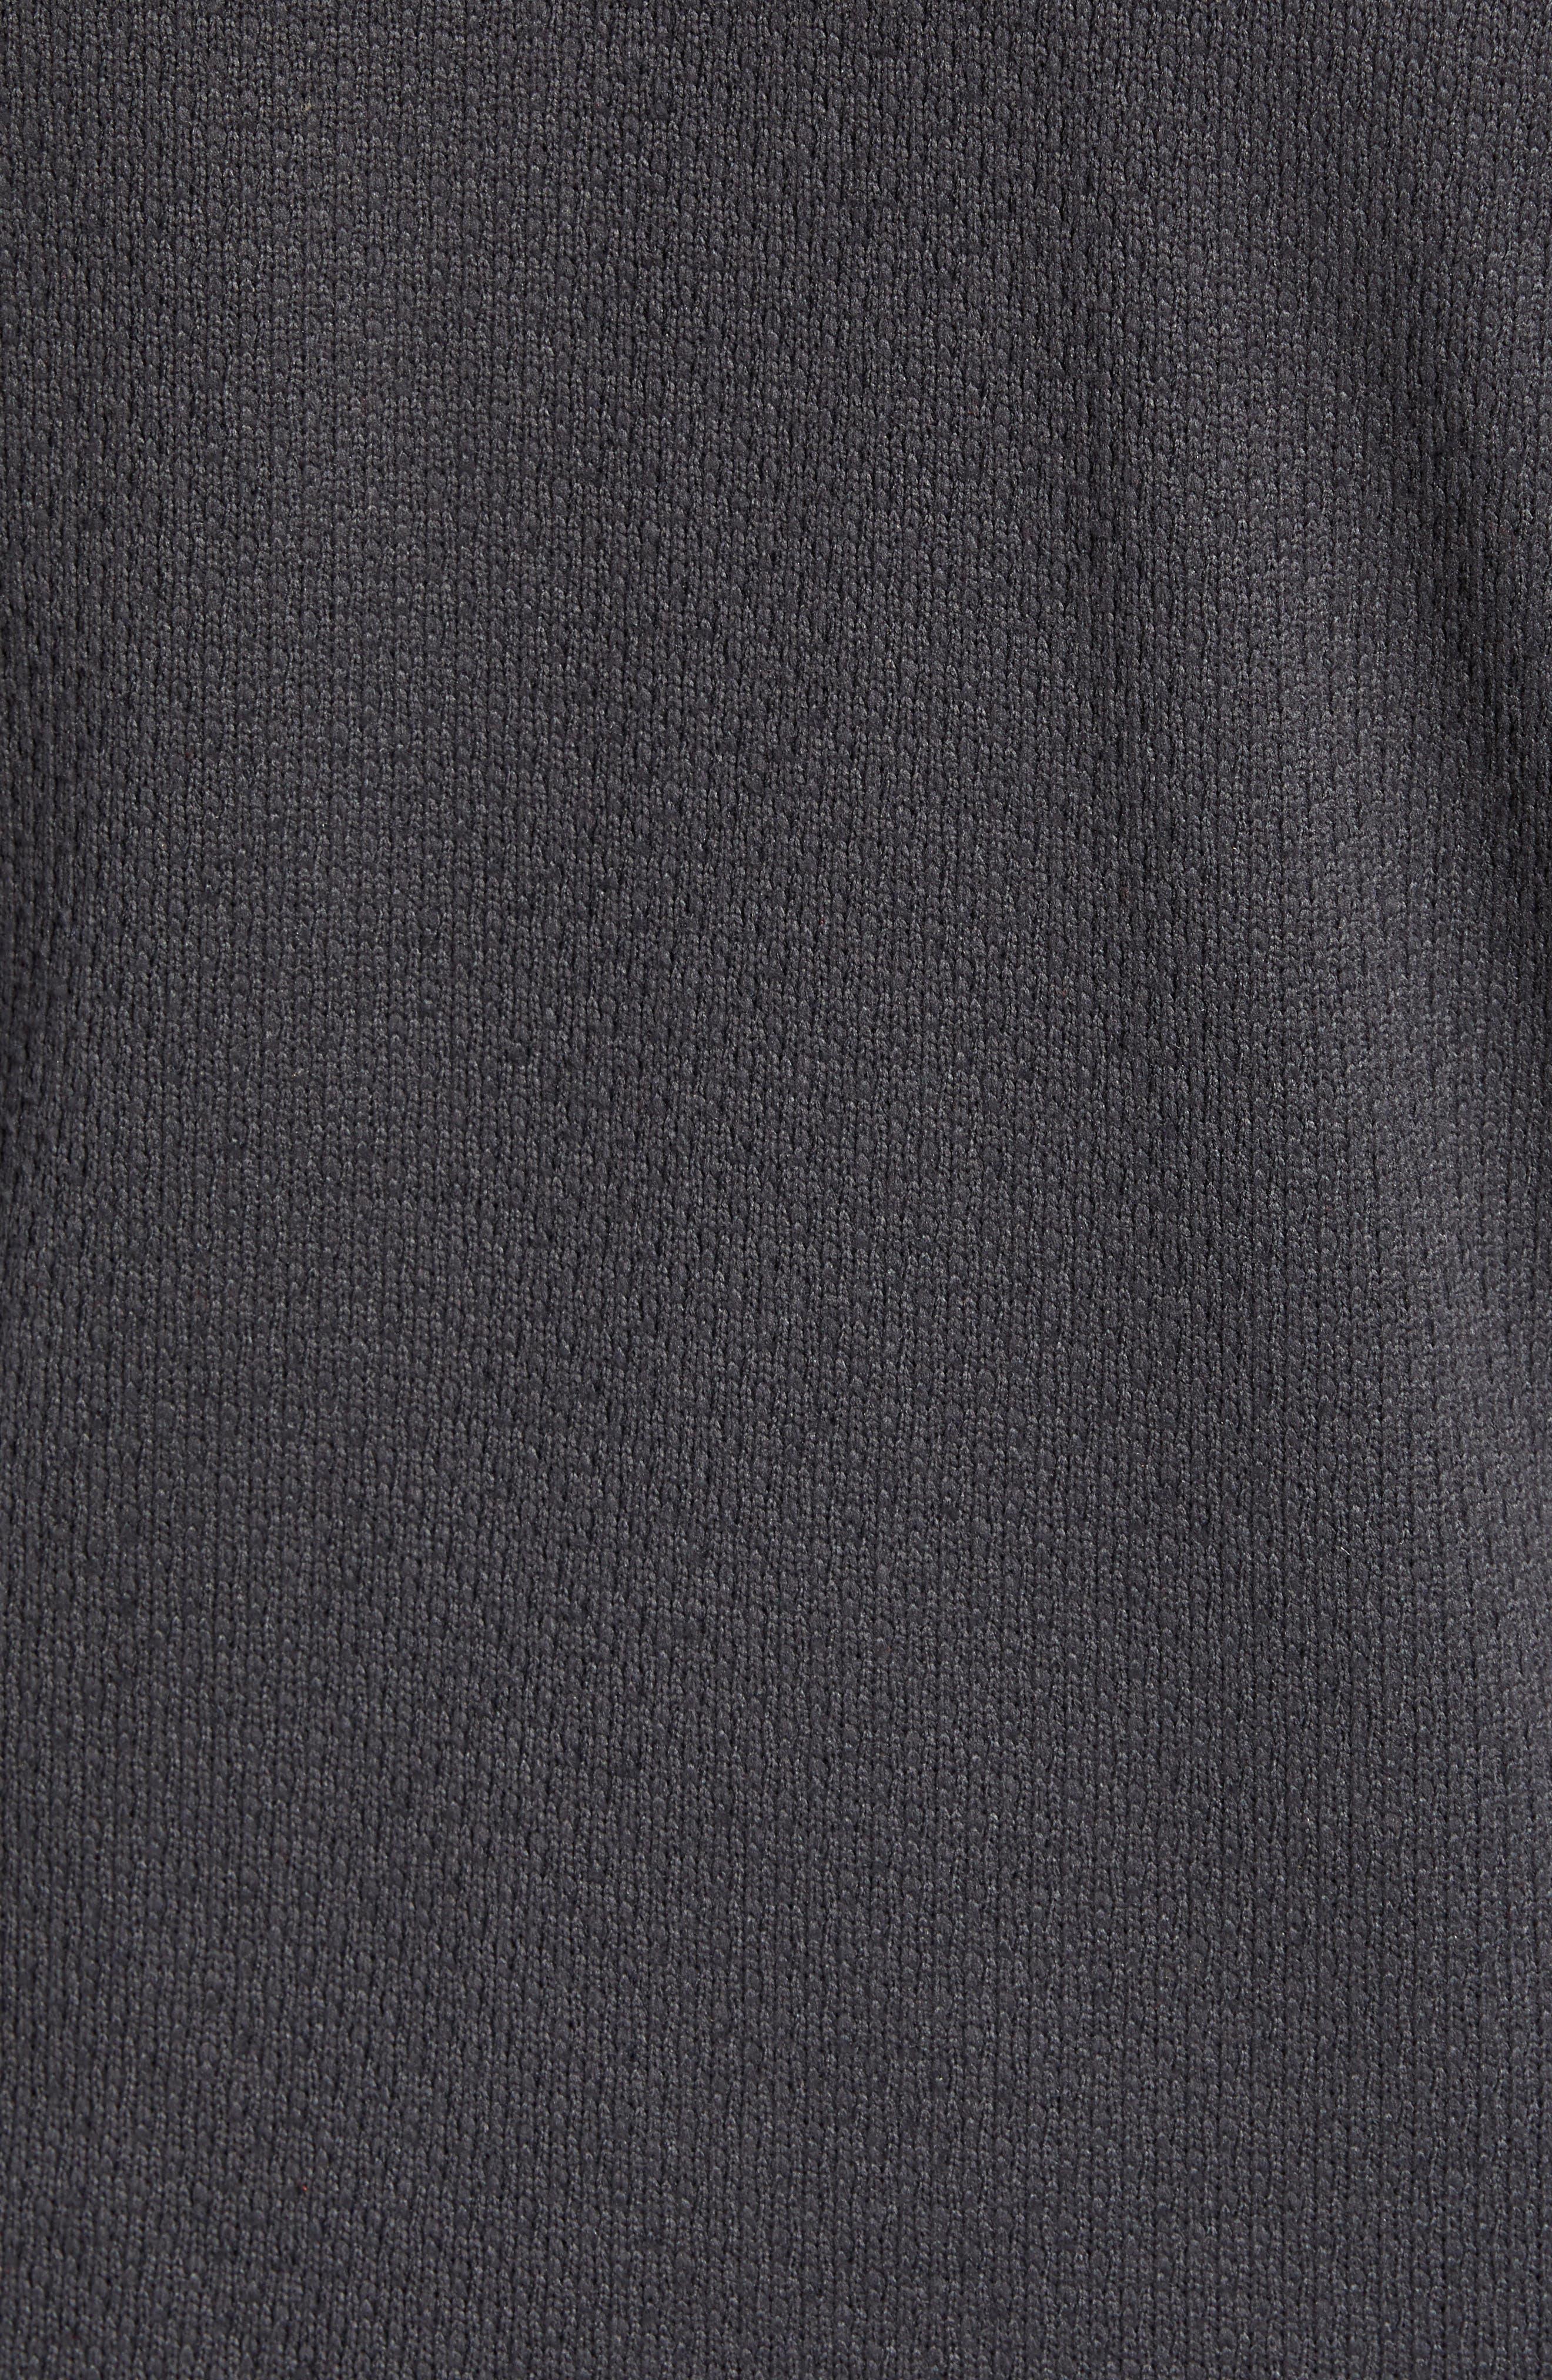 Be-Layed Back Jacket,                             Alternate thumbnail 6, color,                             ASPHALT GREY